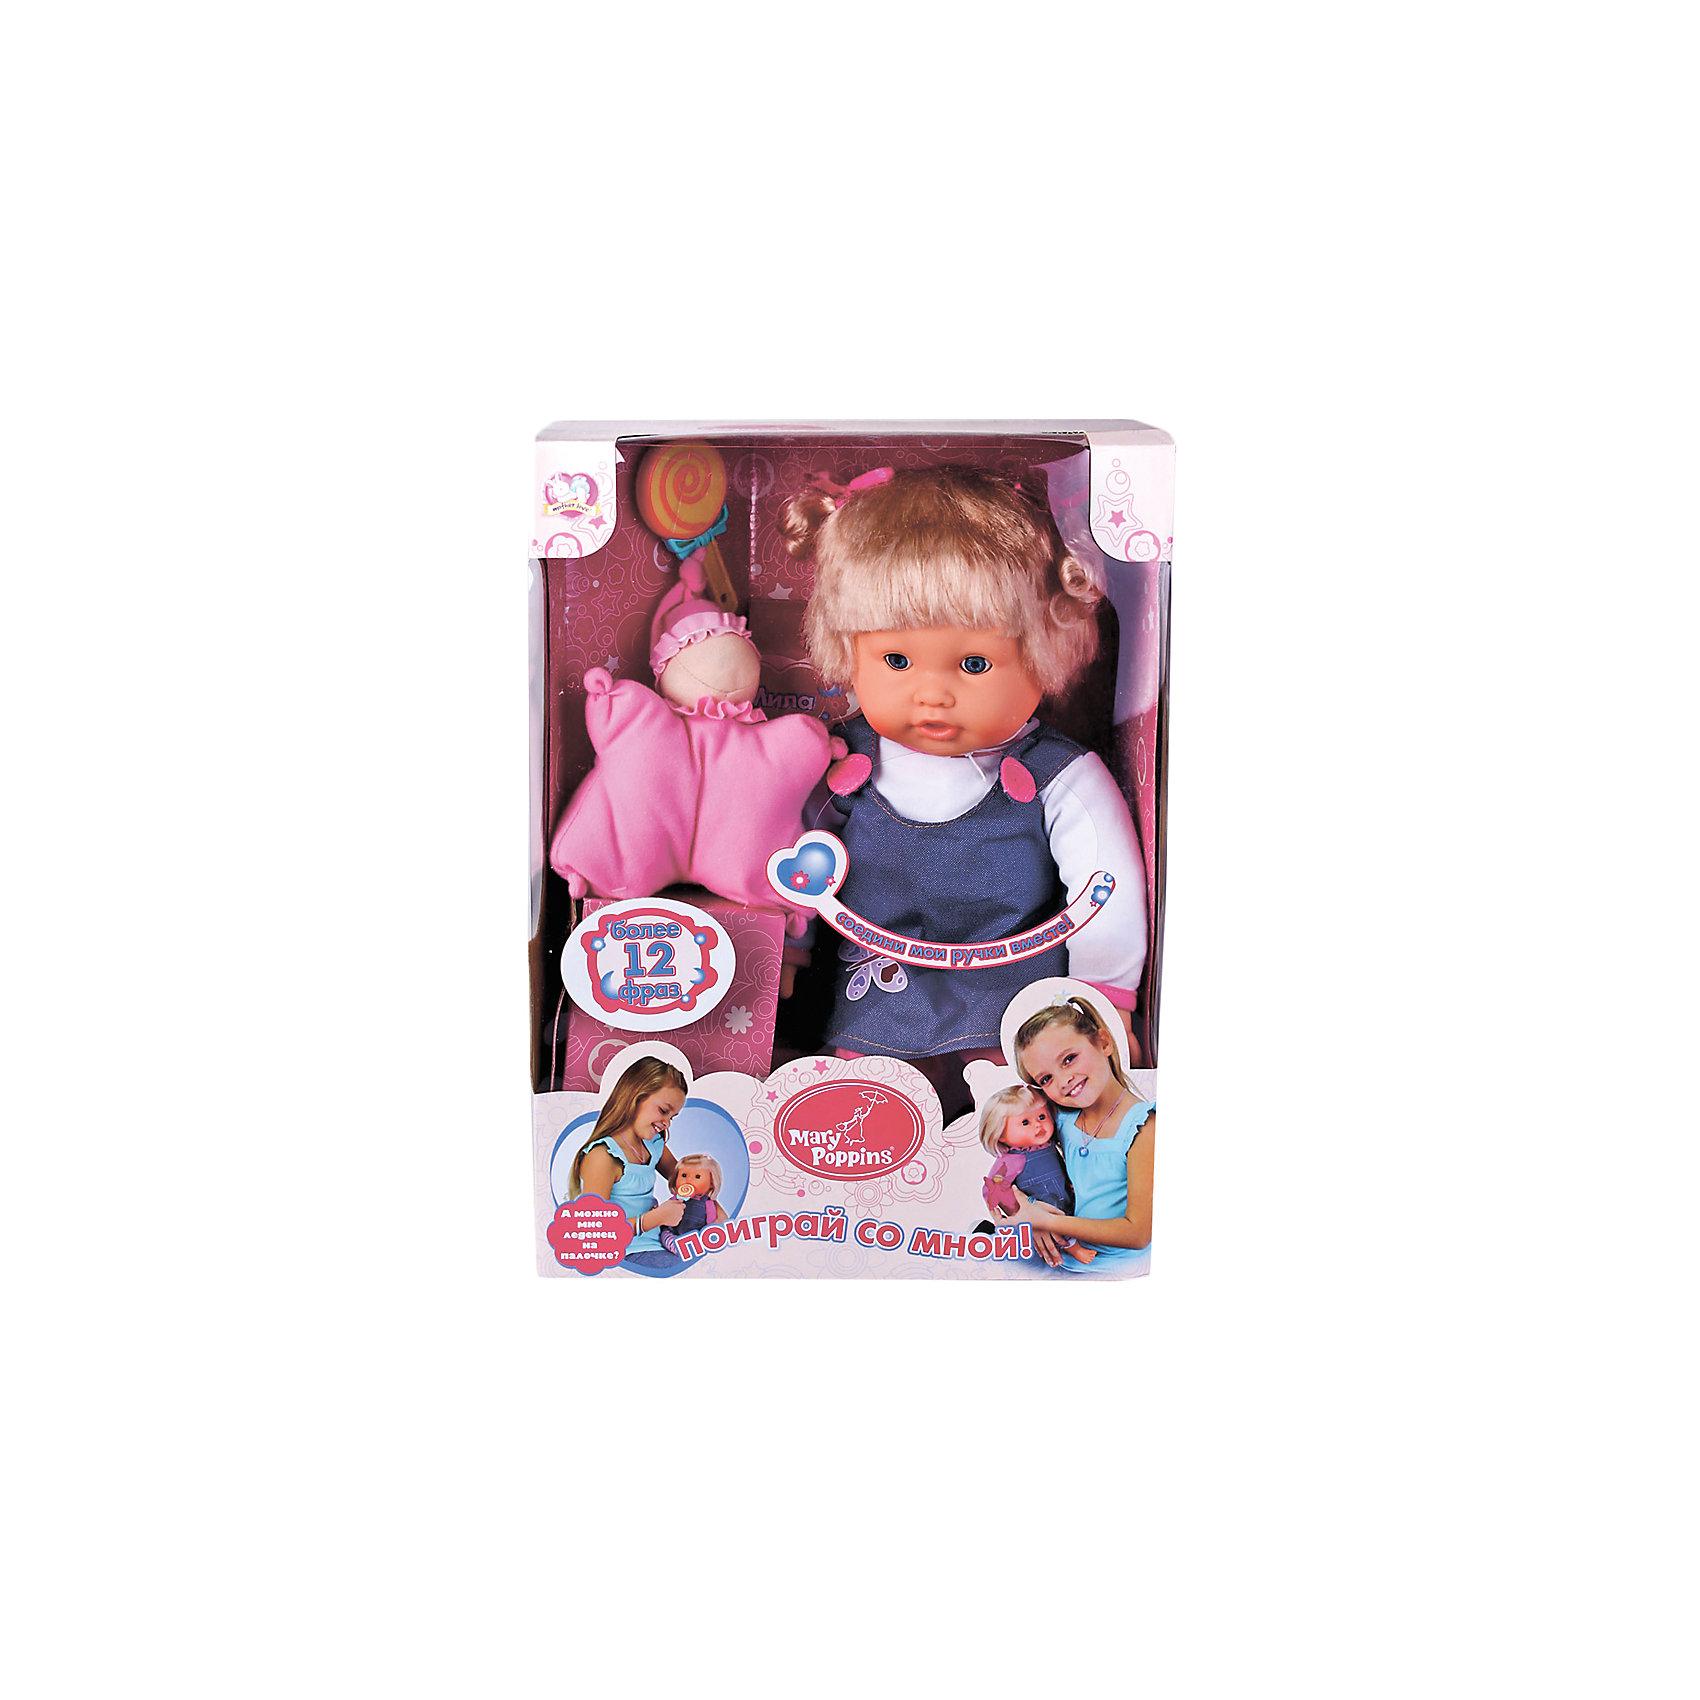 Mary Poppins Интерактивная кукла Я считаю пальчики, Mary Poppins mary poppins интерактивная кукла я считаю пальчики mary poppins